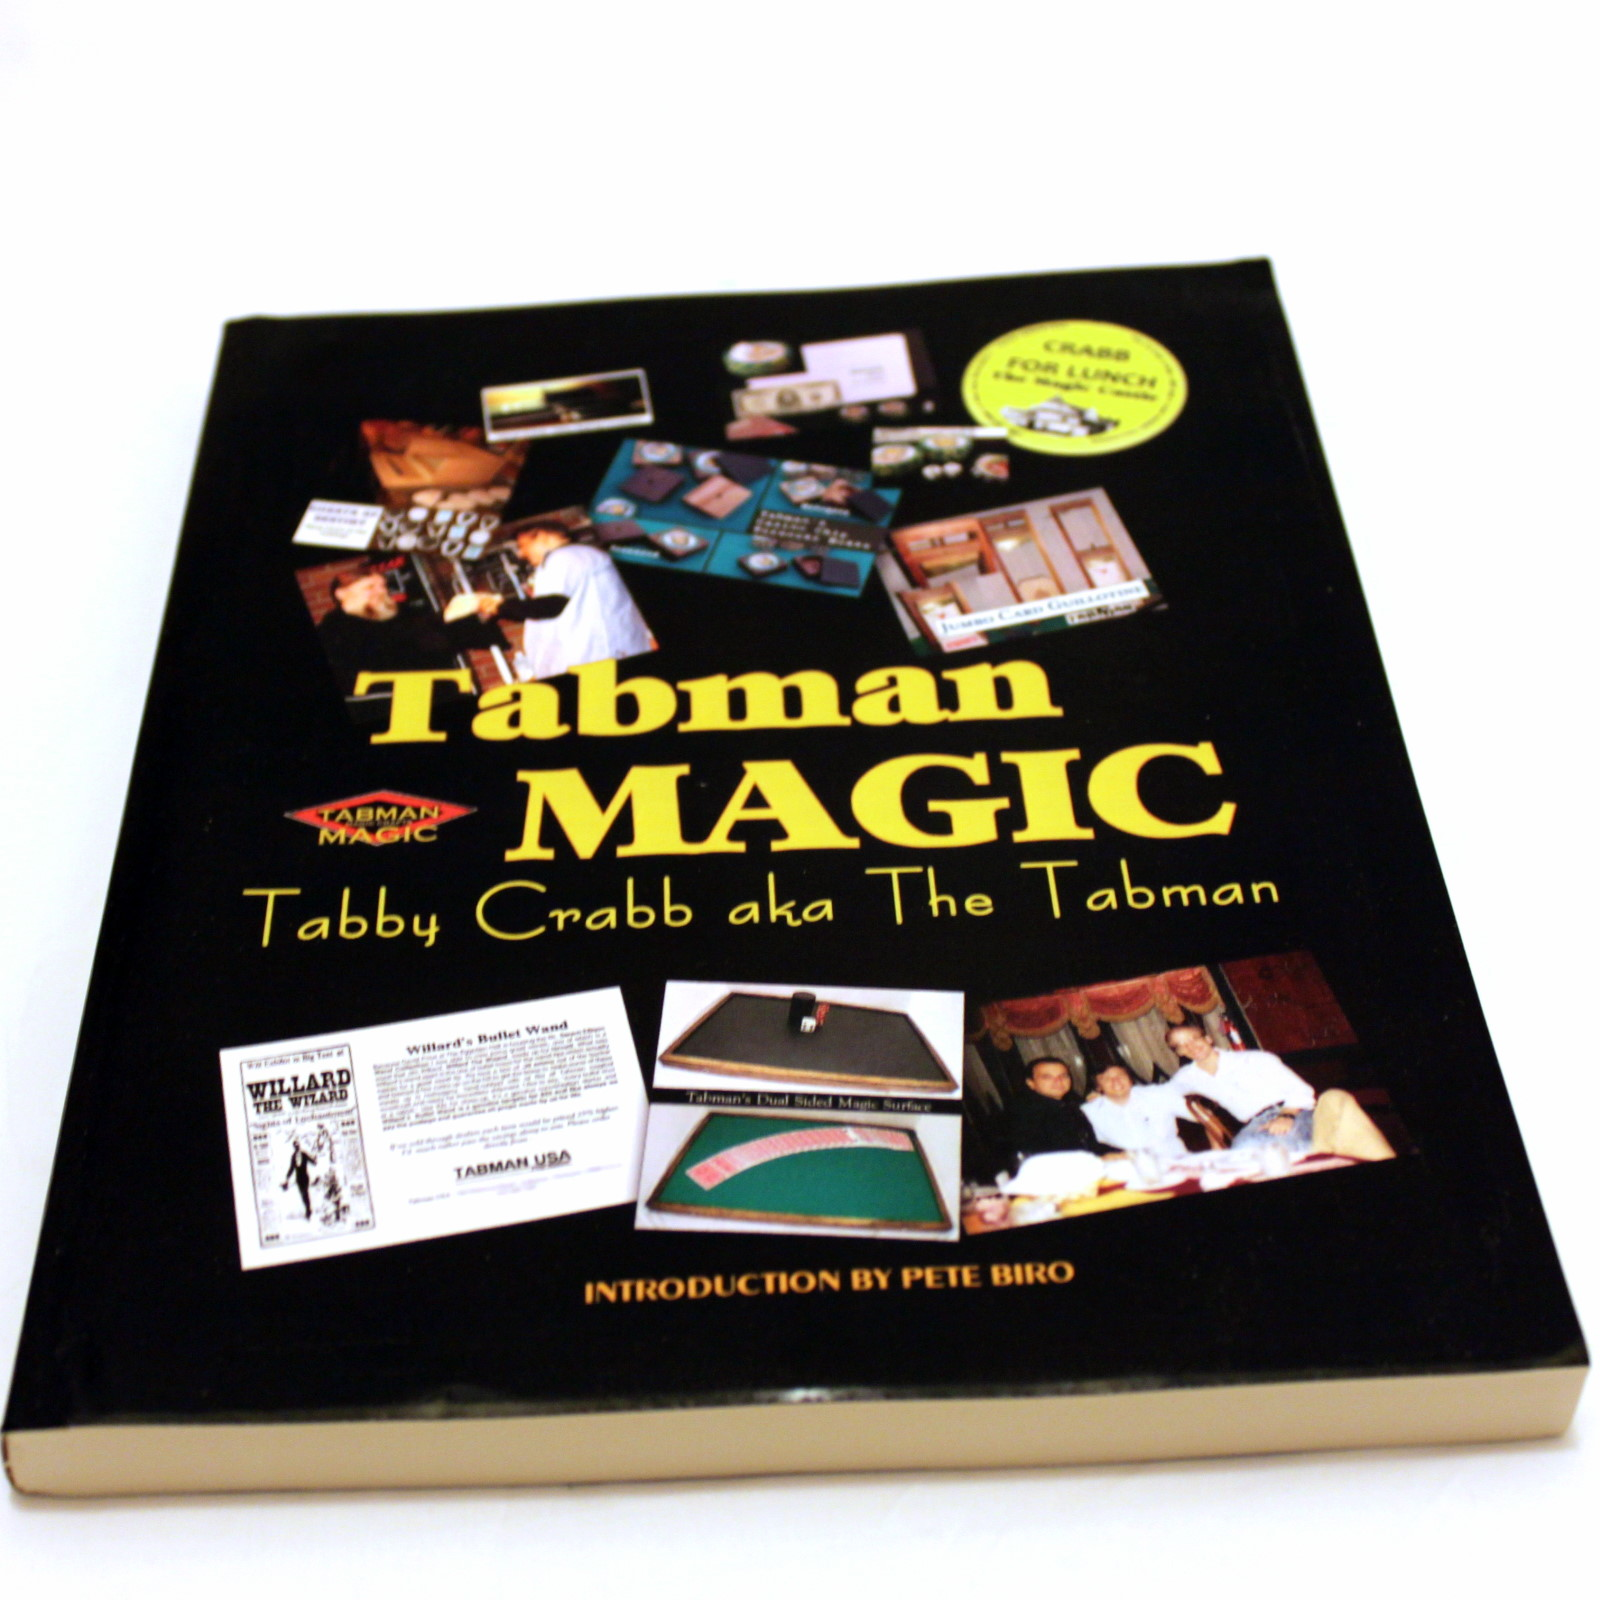 Tabman Magic by Tabby Crabb